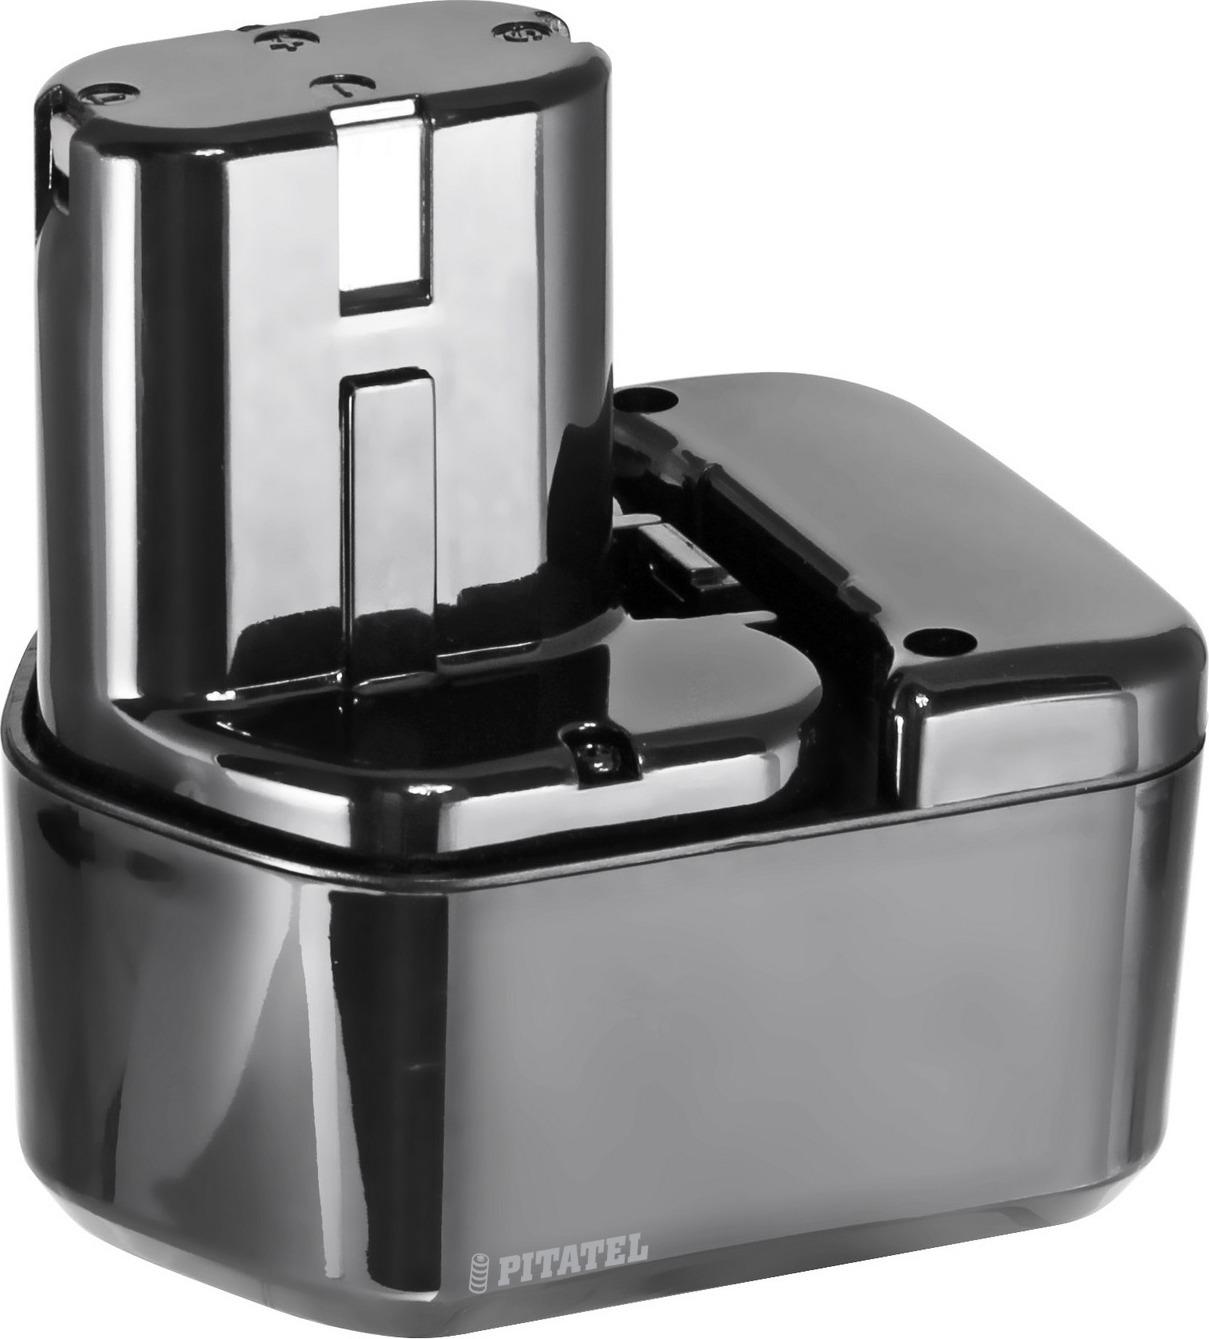 Аккумулятор для инструмента Pitatel для HITACHI. TSB-061-HIT12B-21M все цены